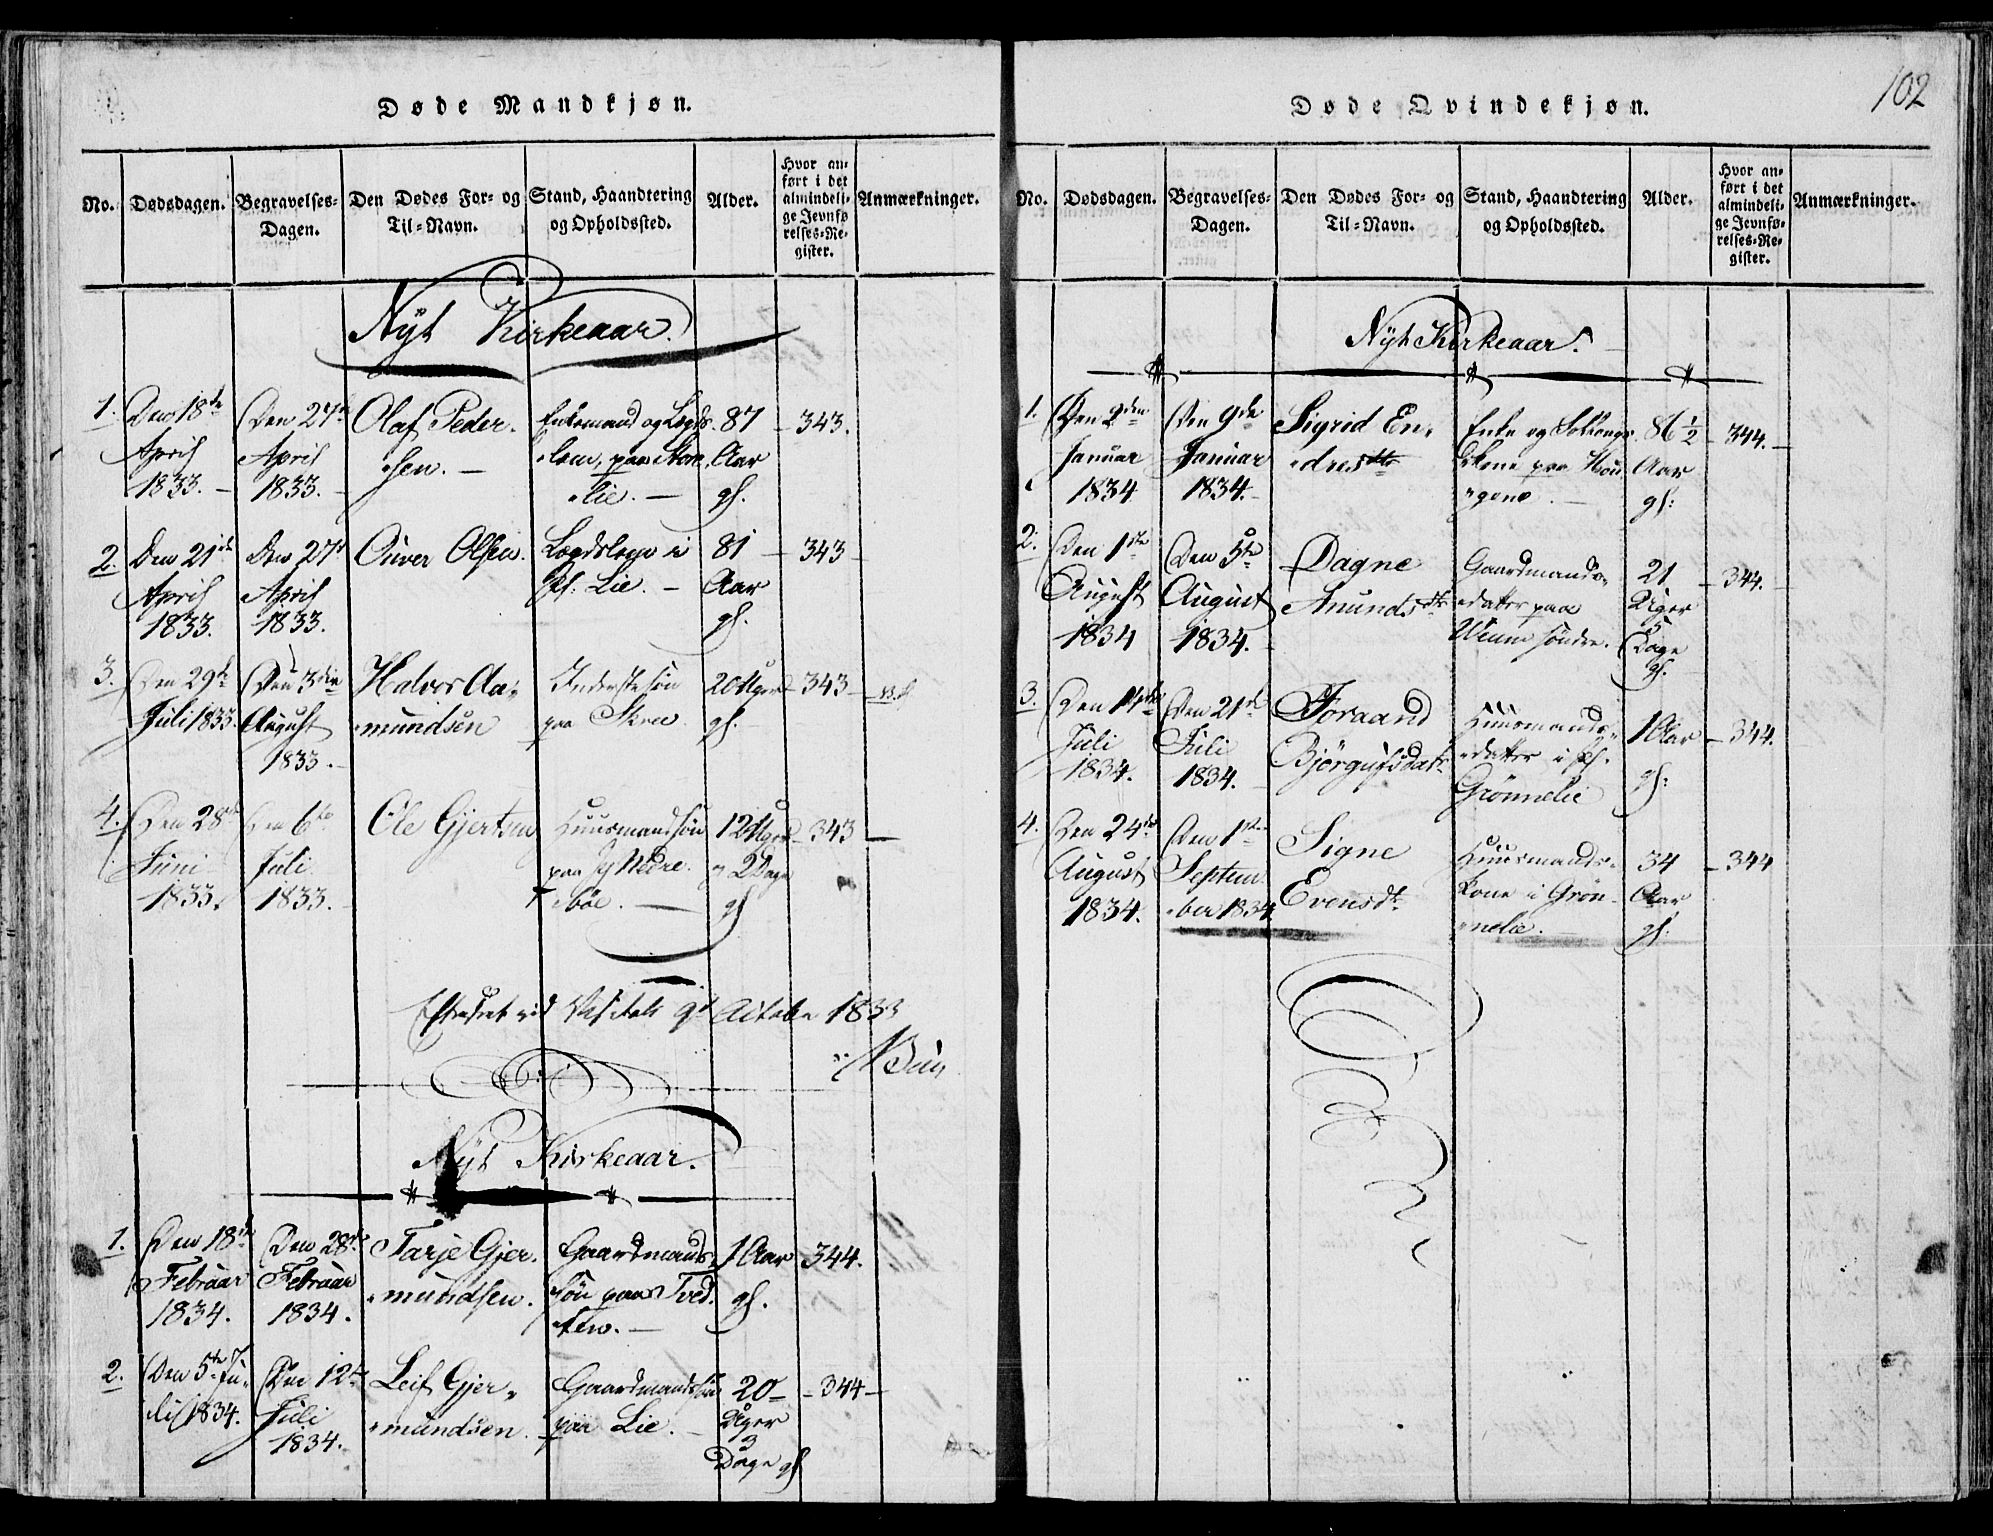 SAKO, Fyresdal kirkebøker, F/Fb/L0001: Ministerialbok nr. II 1, 1815-1854, s. 102